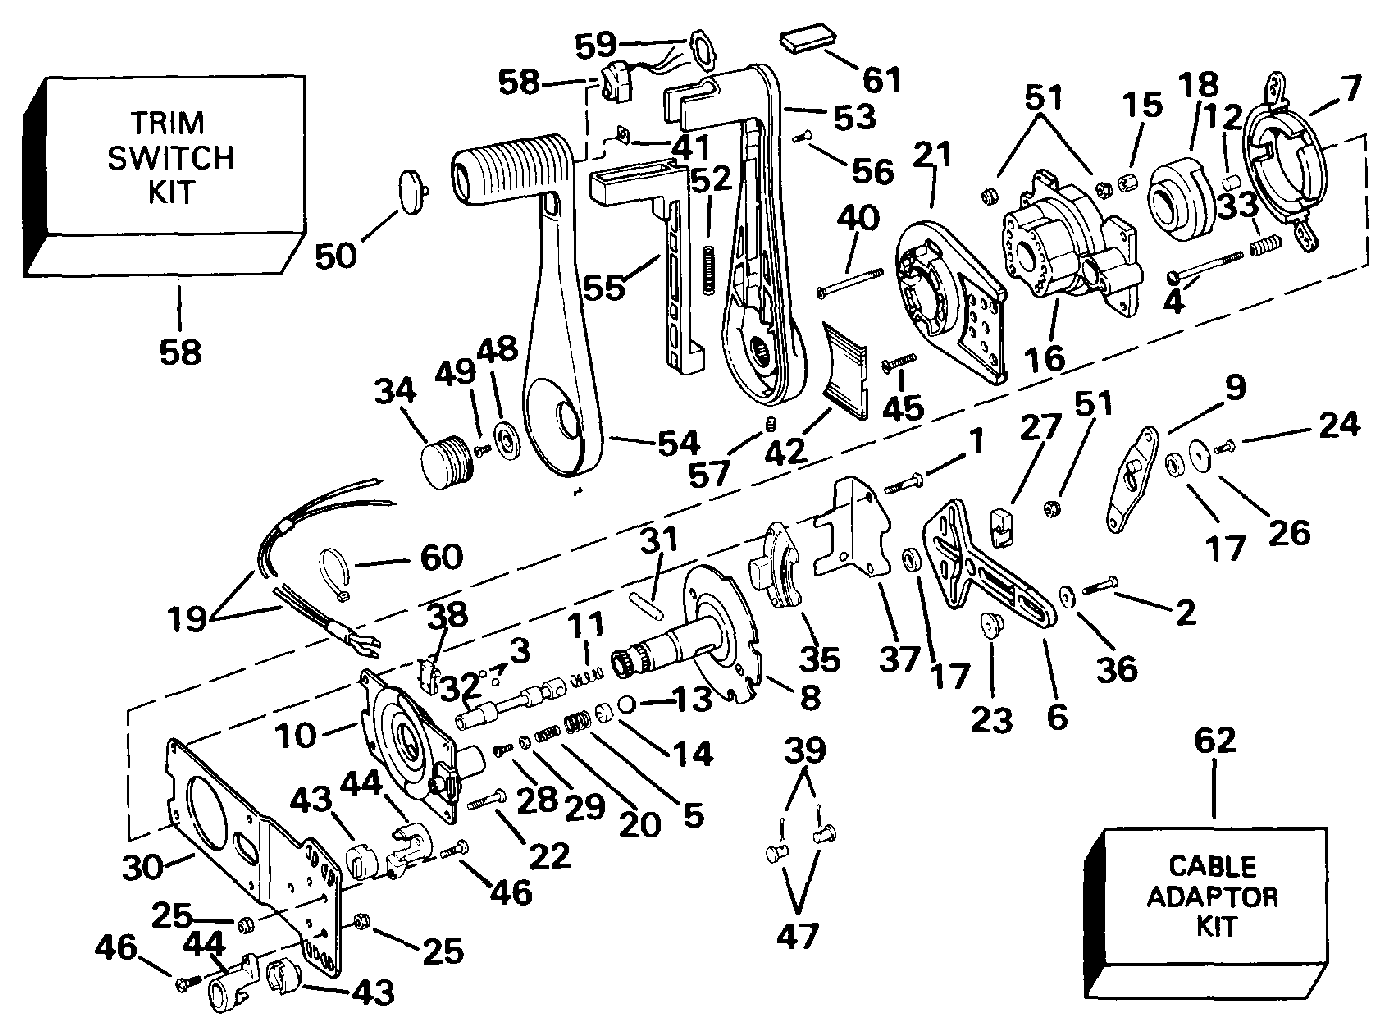 omc cobra 5.8 wiring diagram